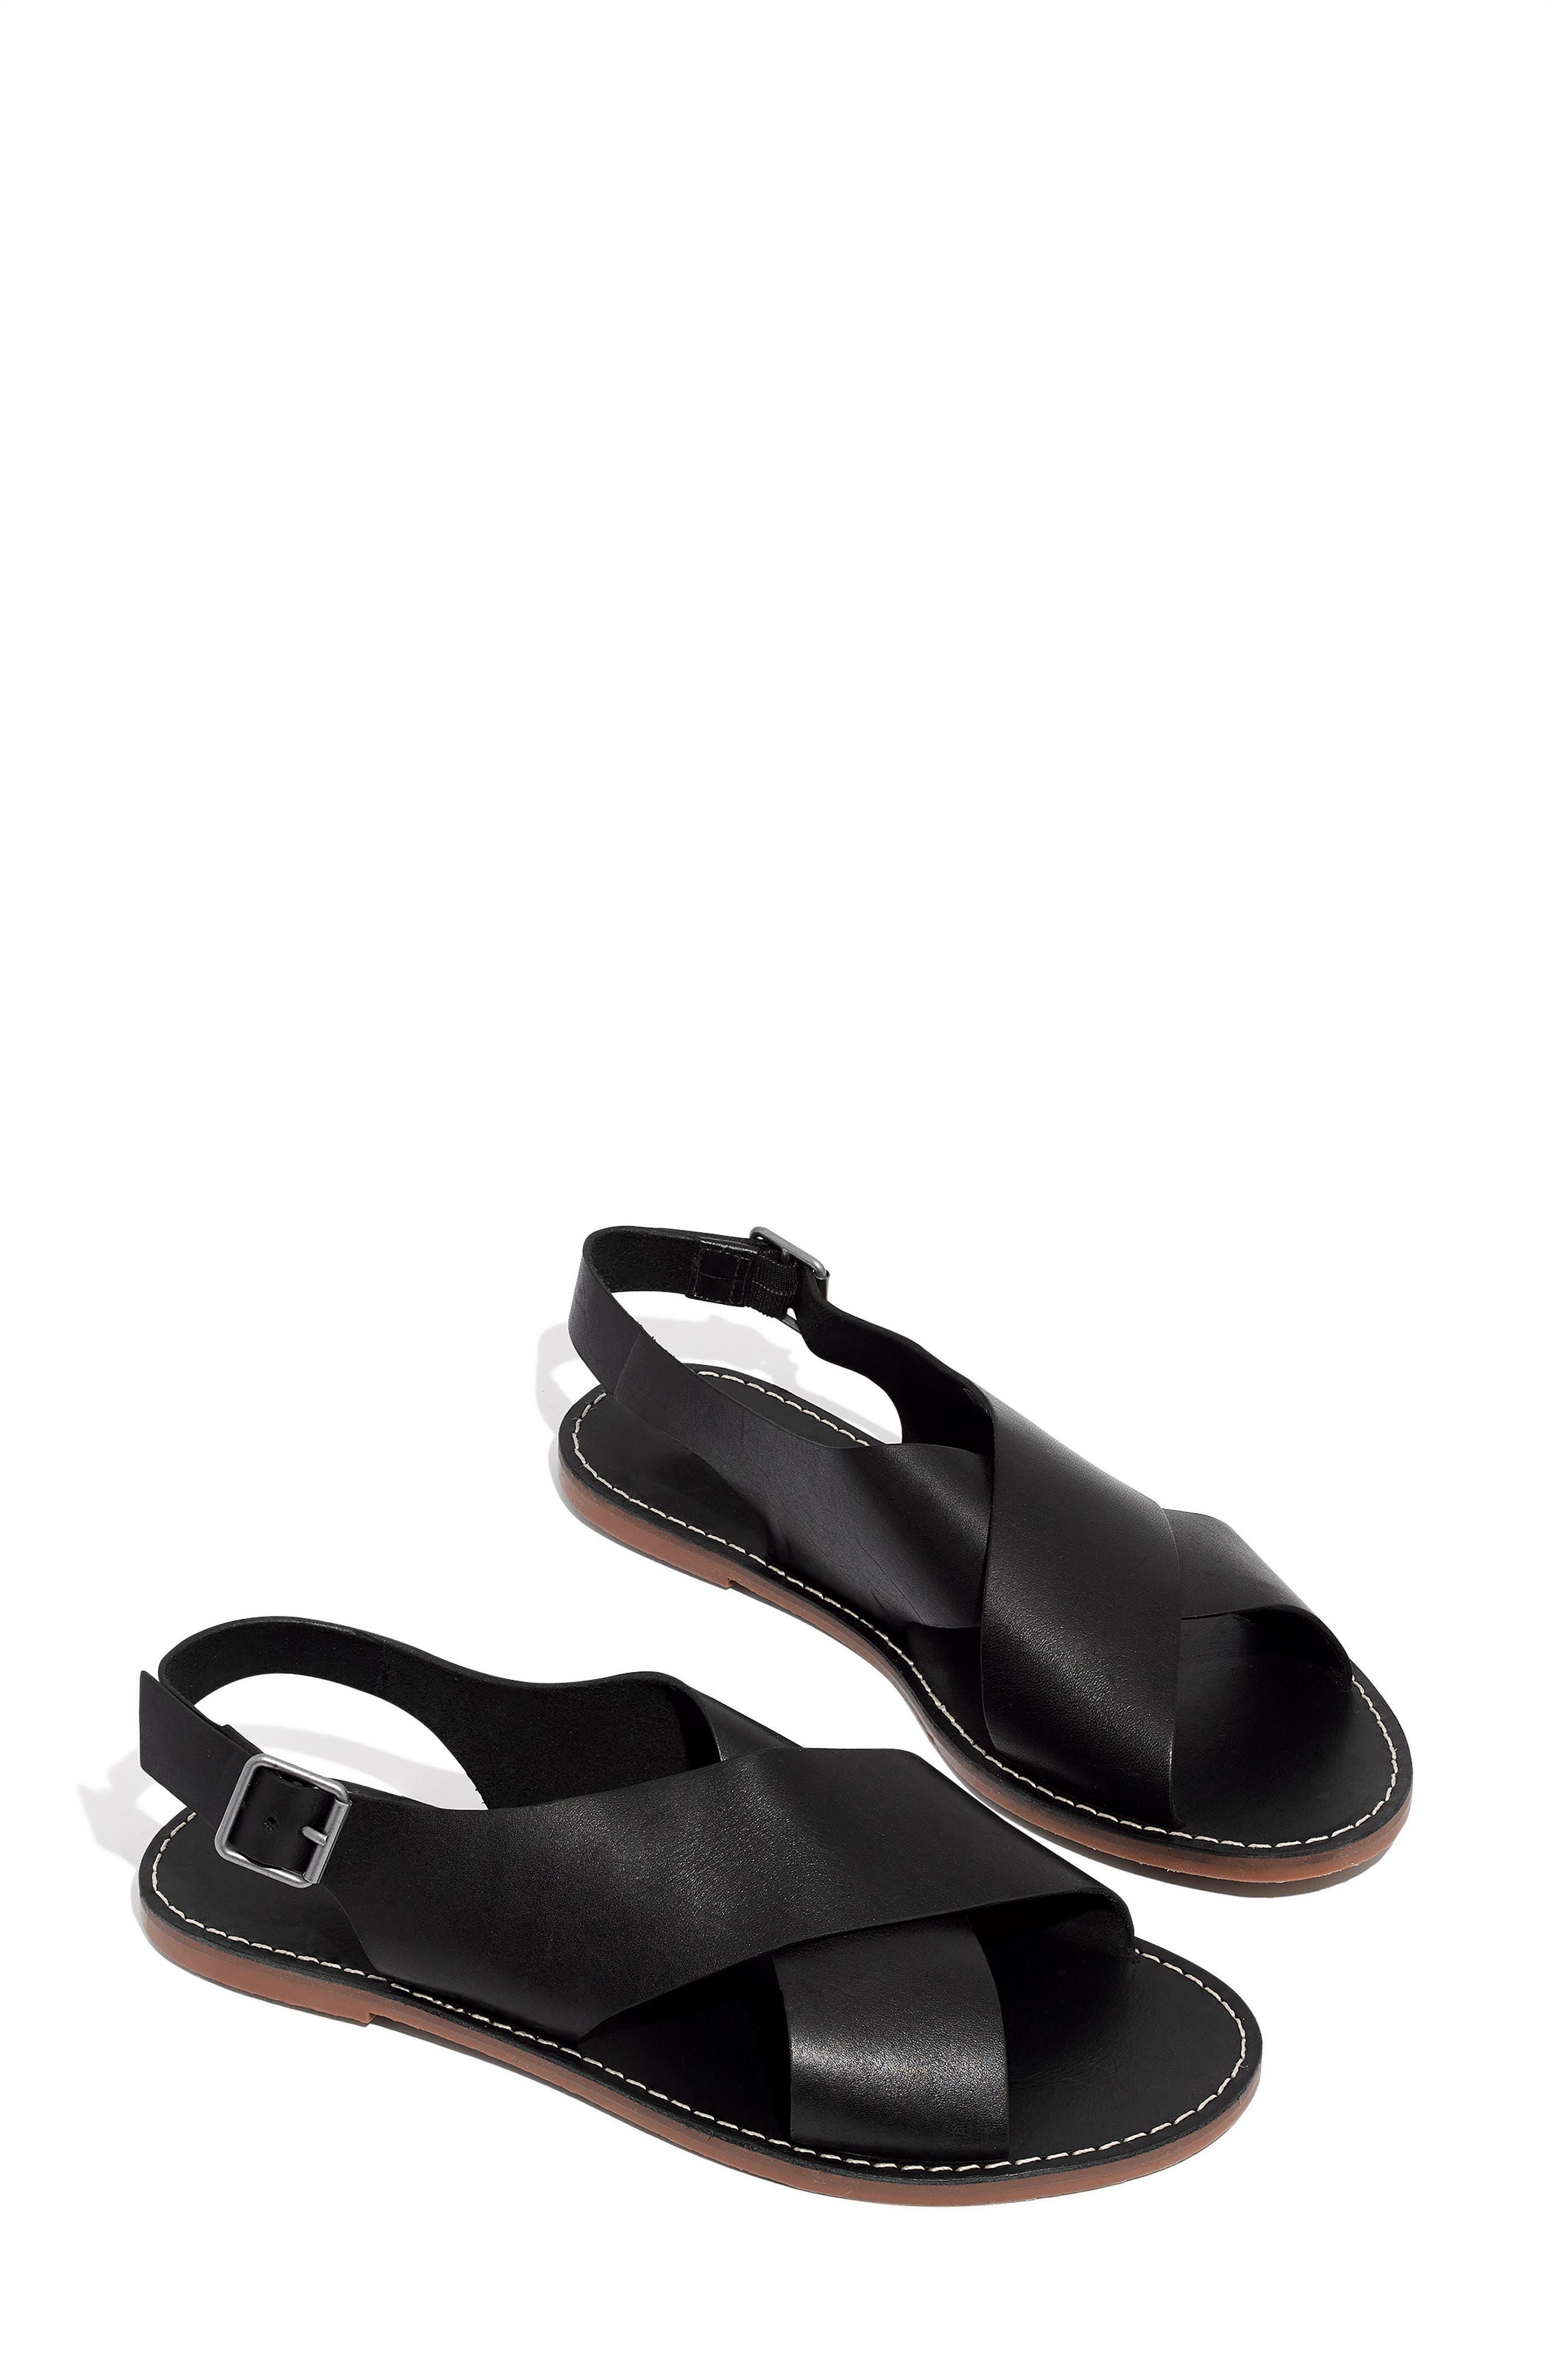 MADEWELL, Boardwalk Flat Sandal, Alternate thumbnail 9, color, TRUE BLACK